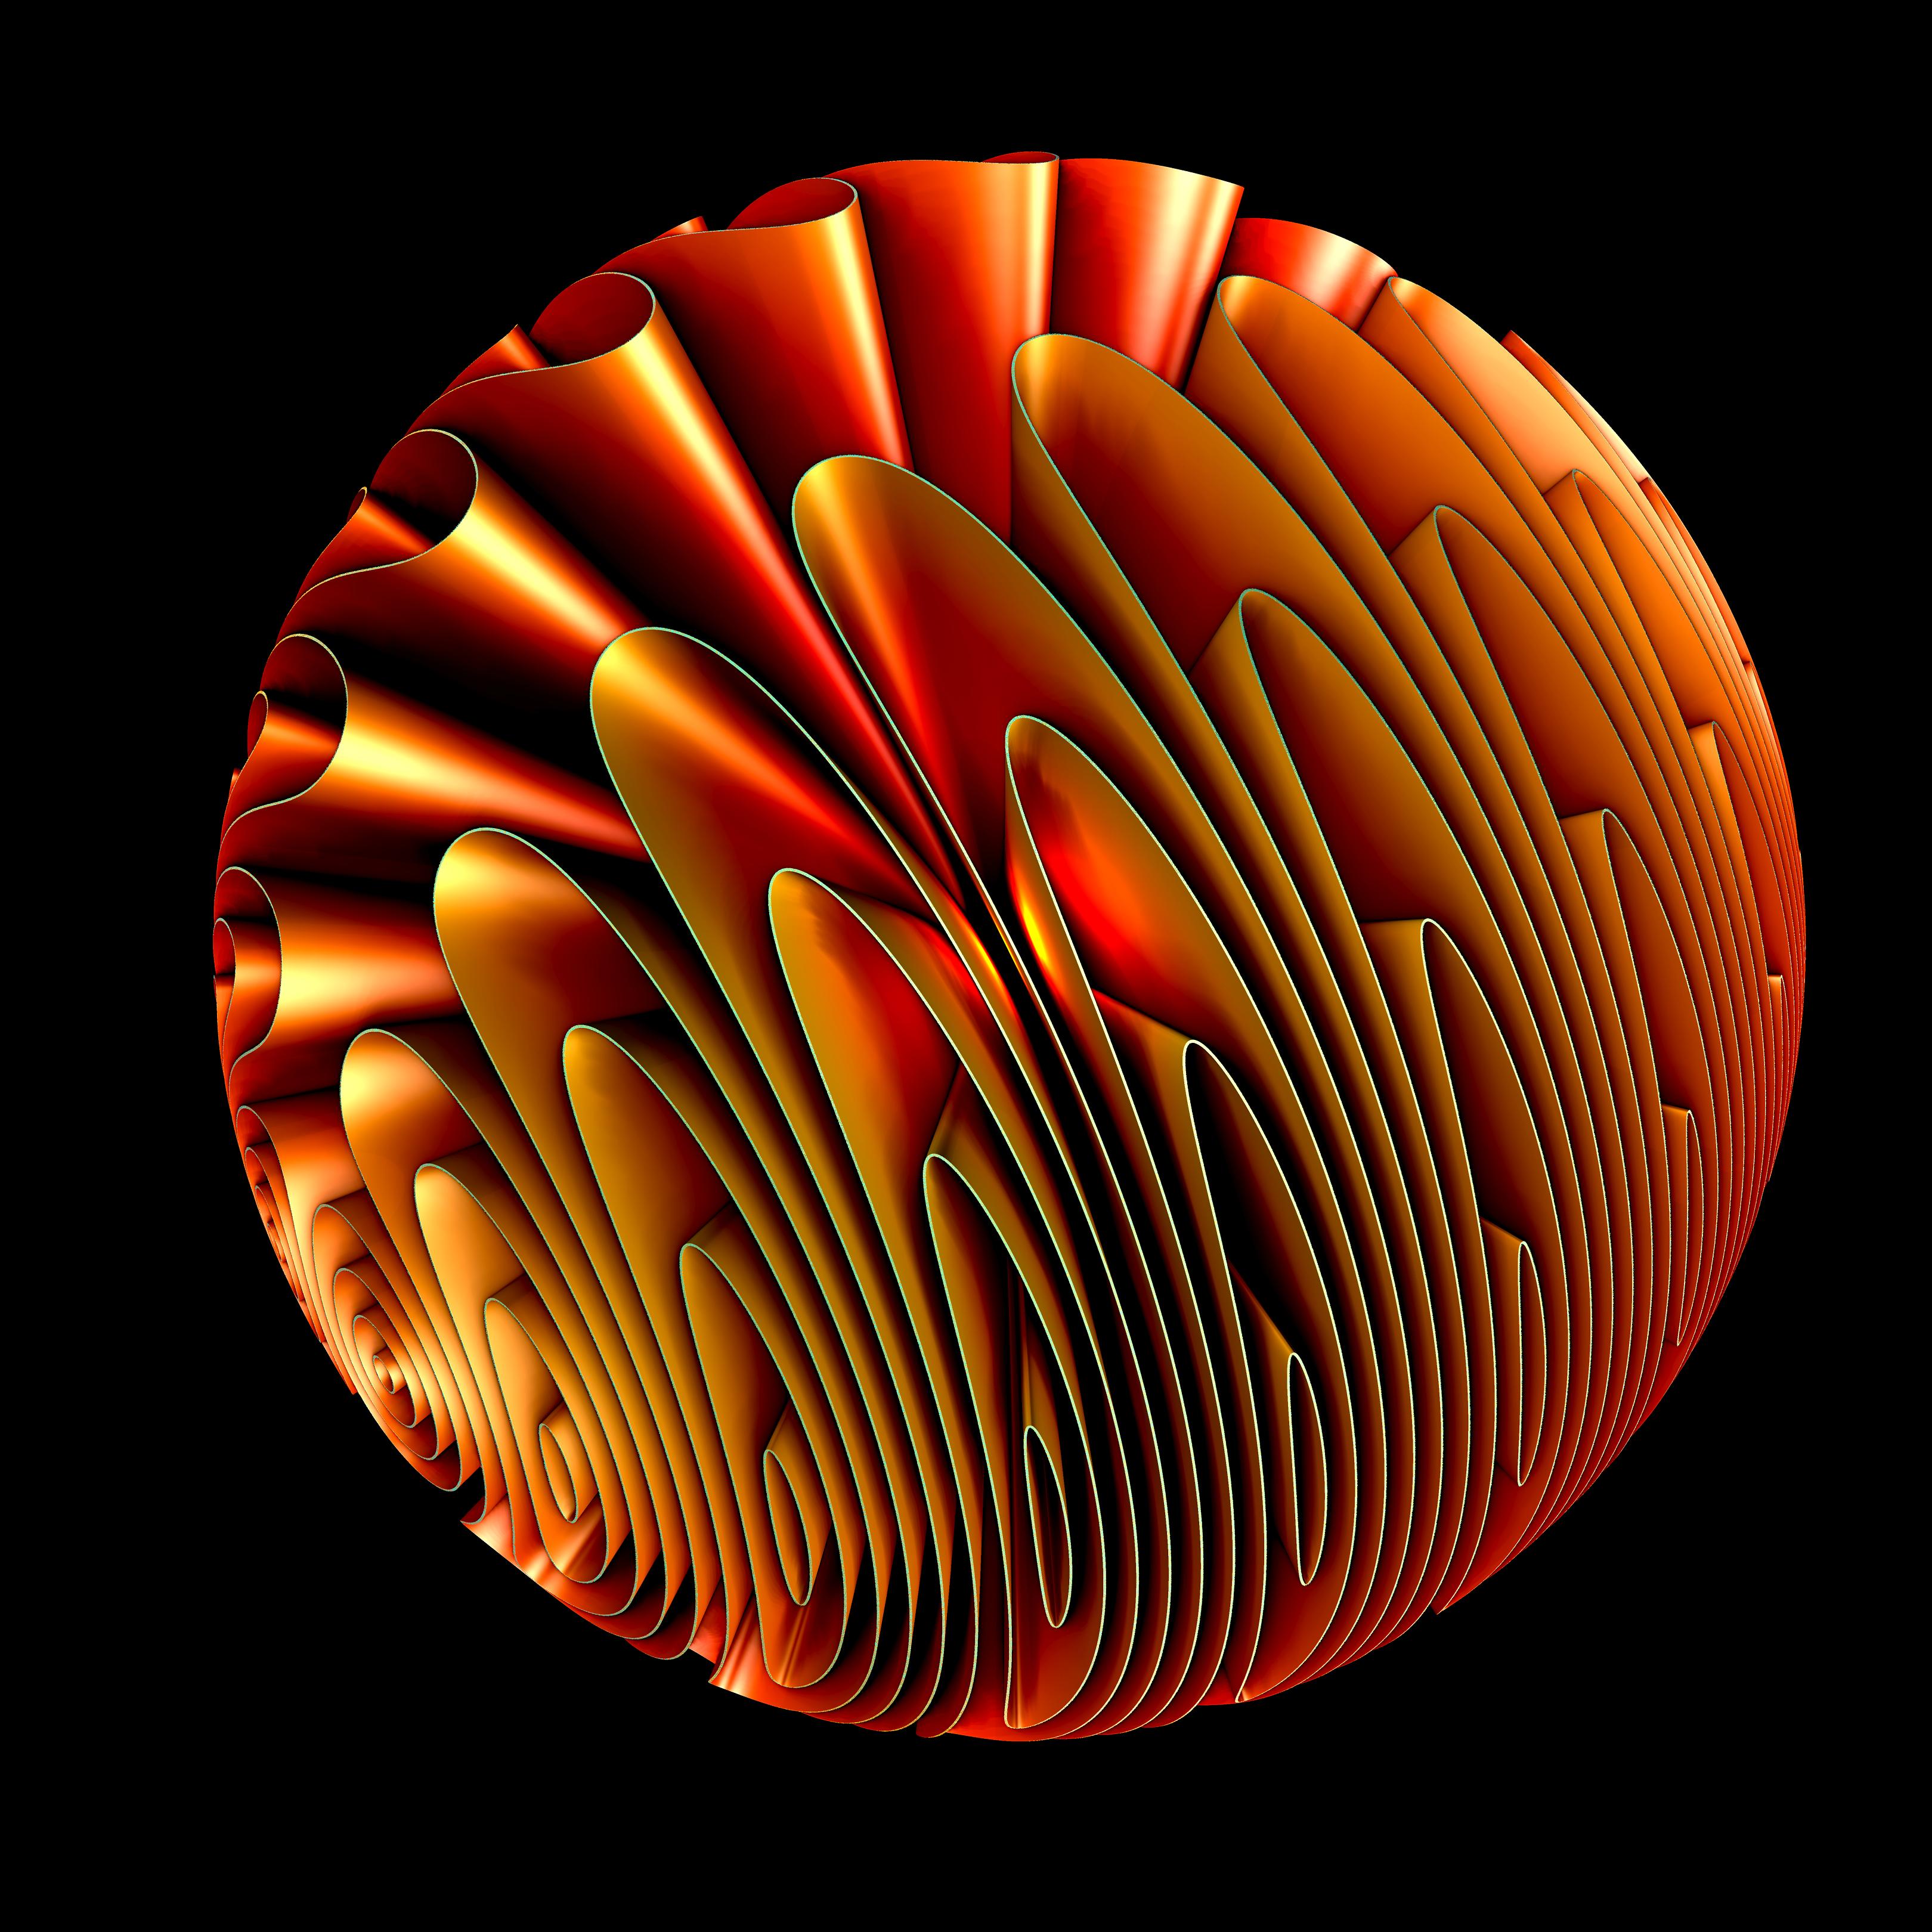 Aiamdagpa, ejemplo de Planeta Fractal